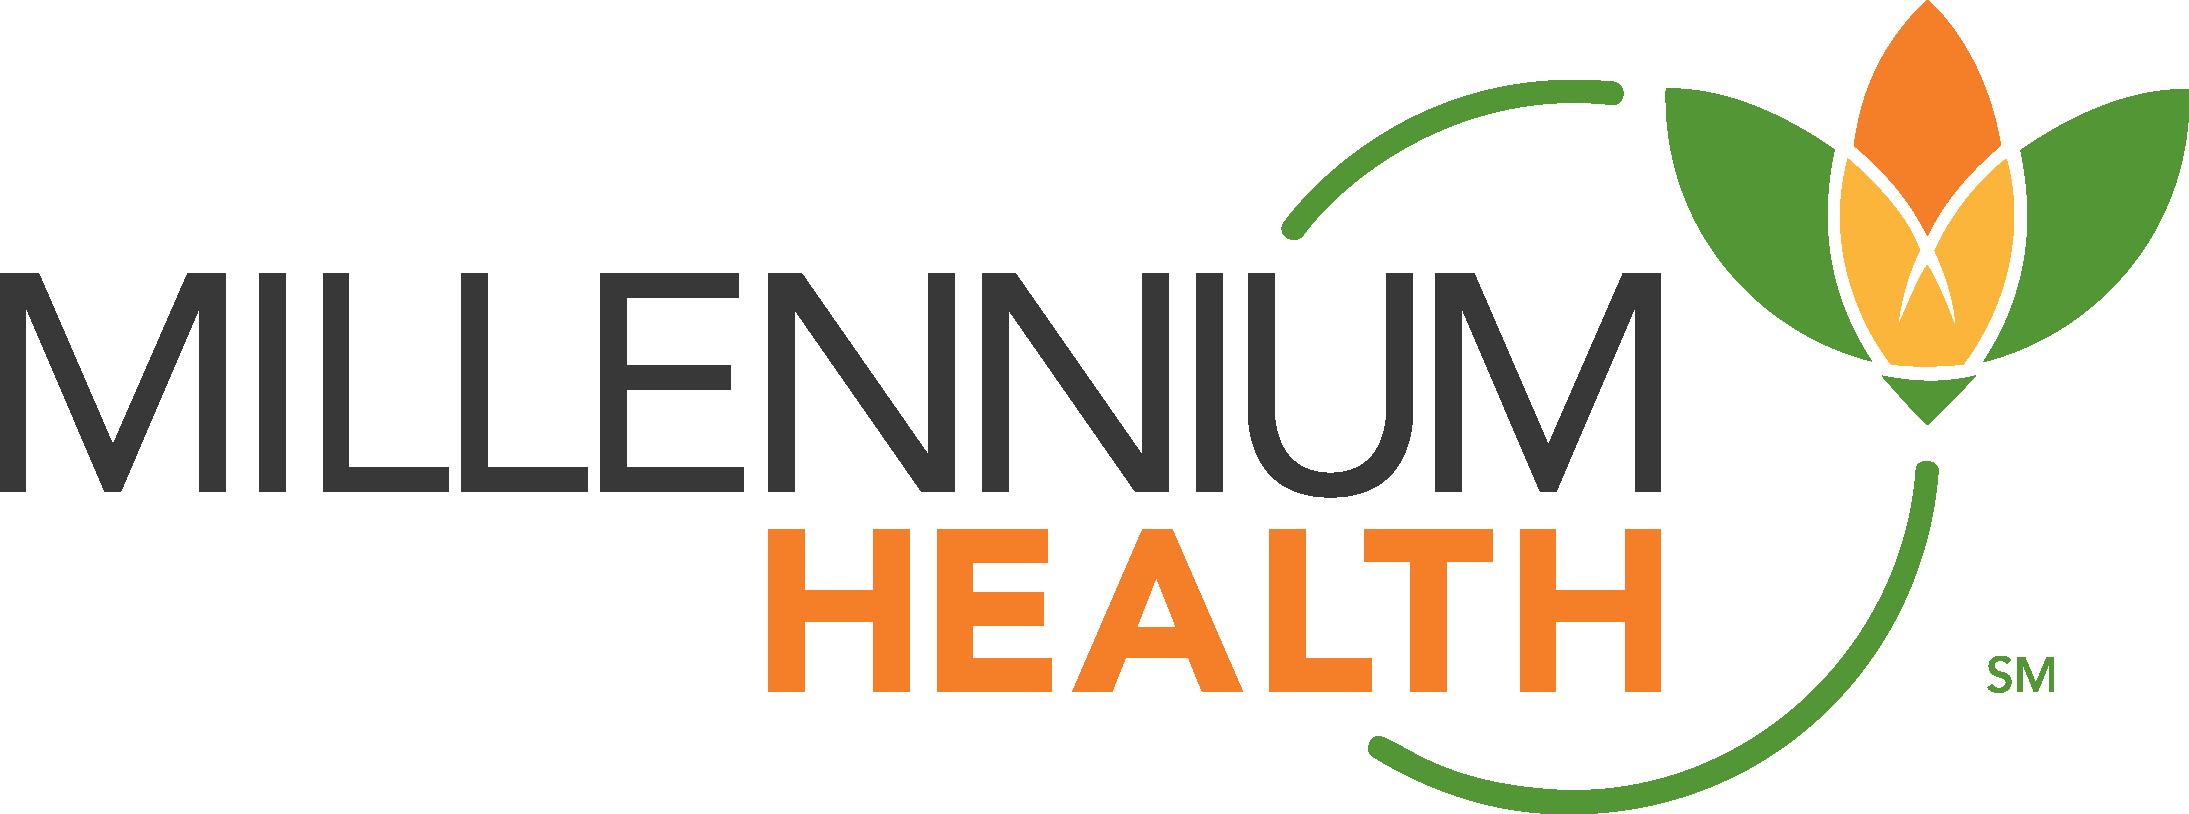 Millennium Health.png